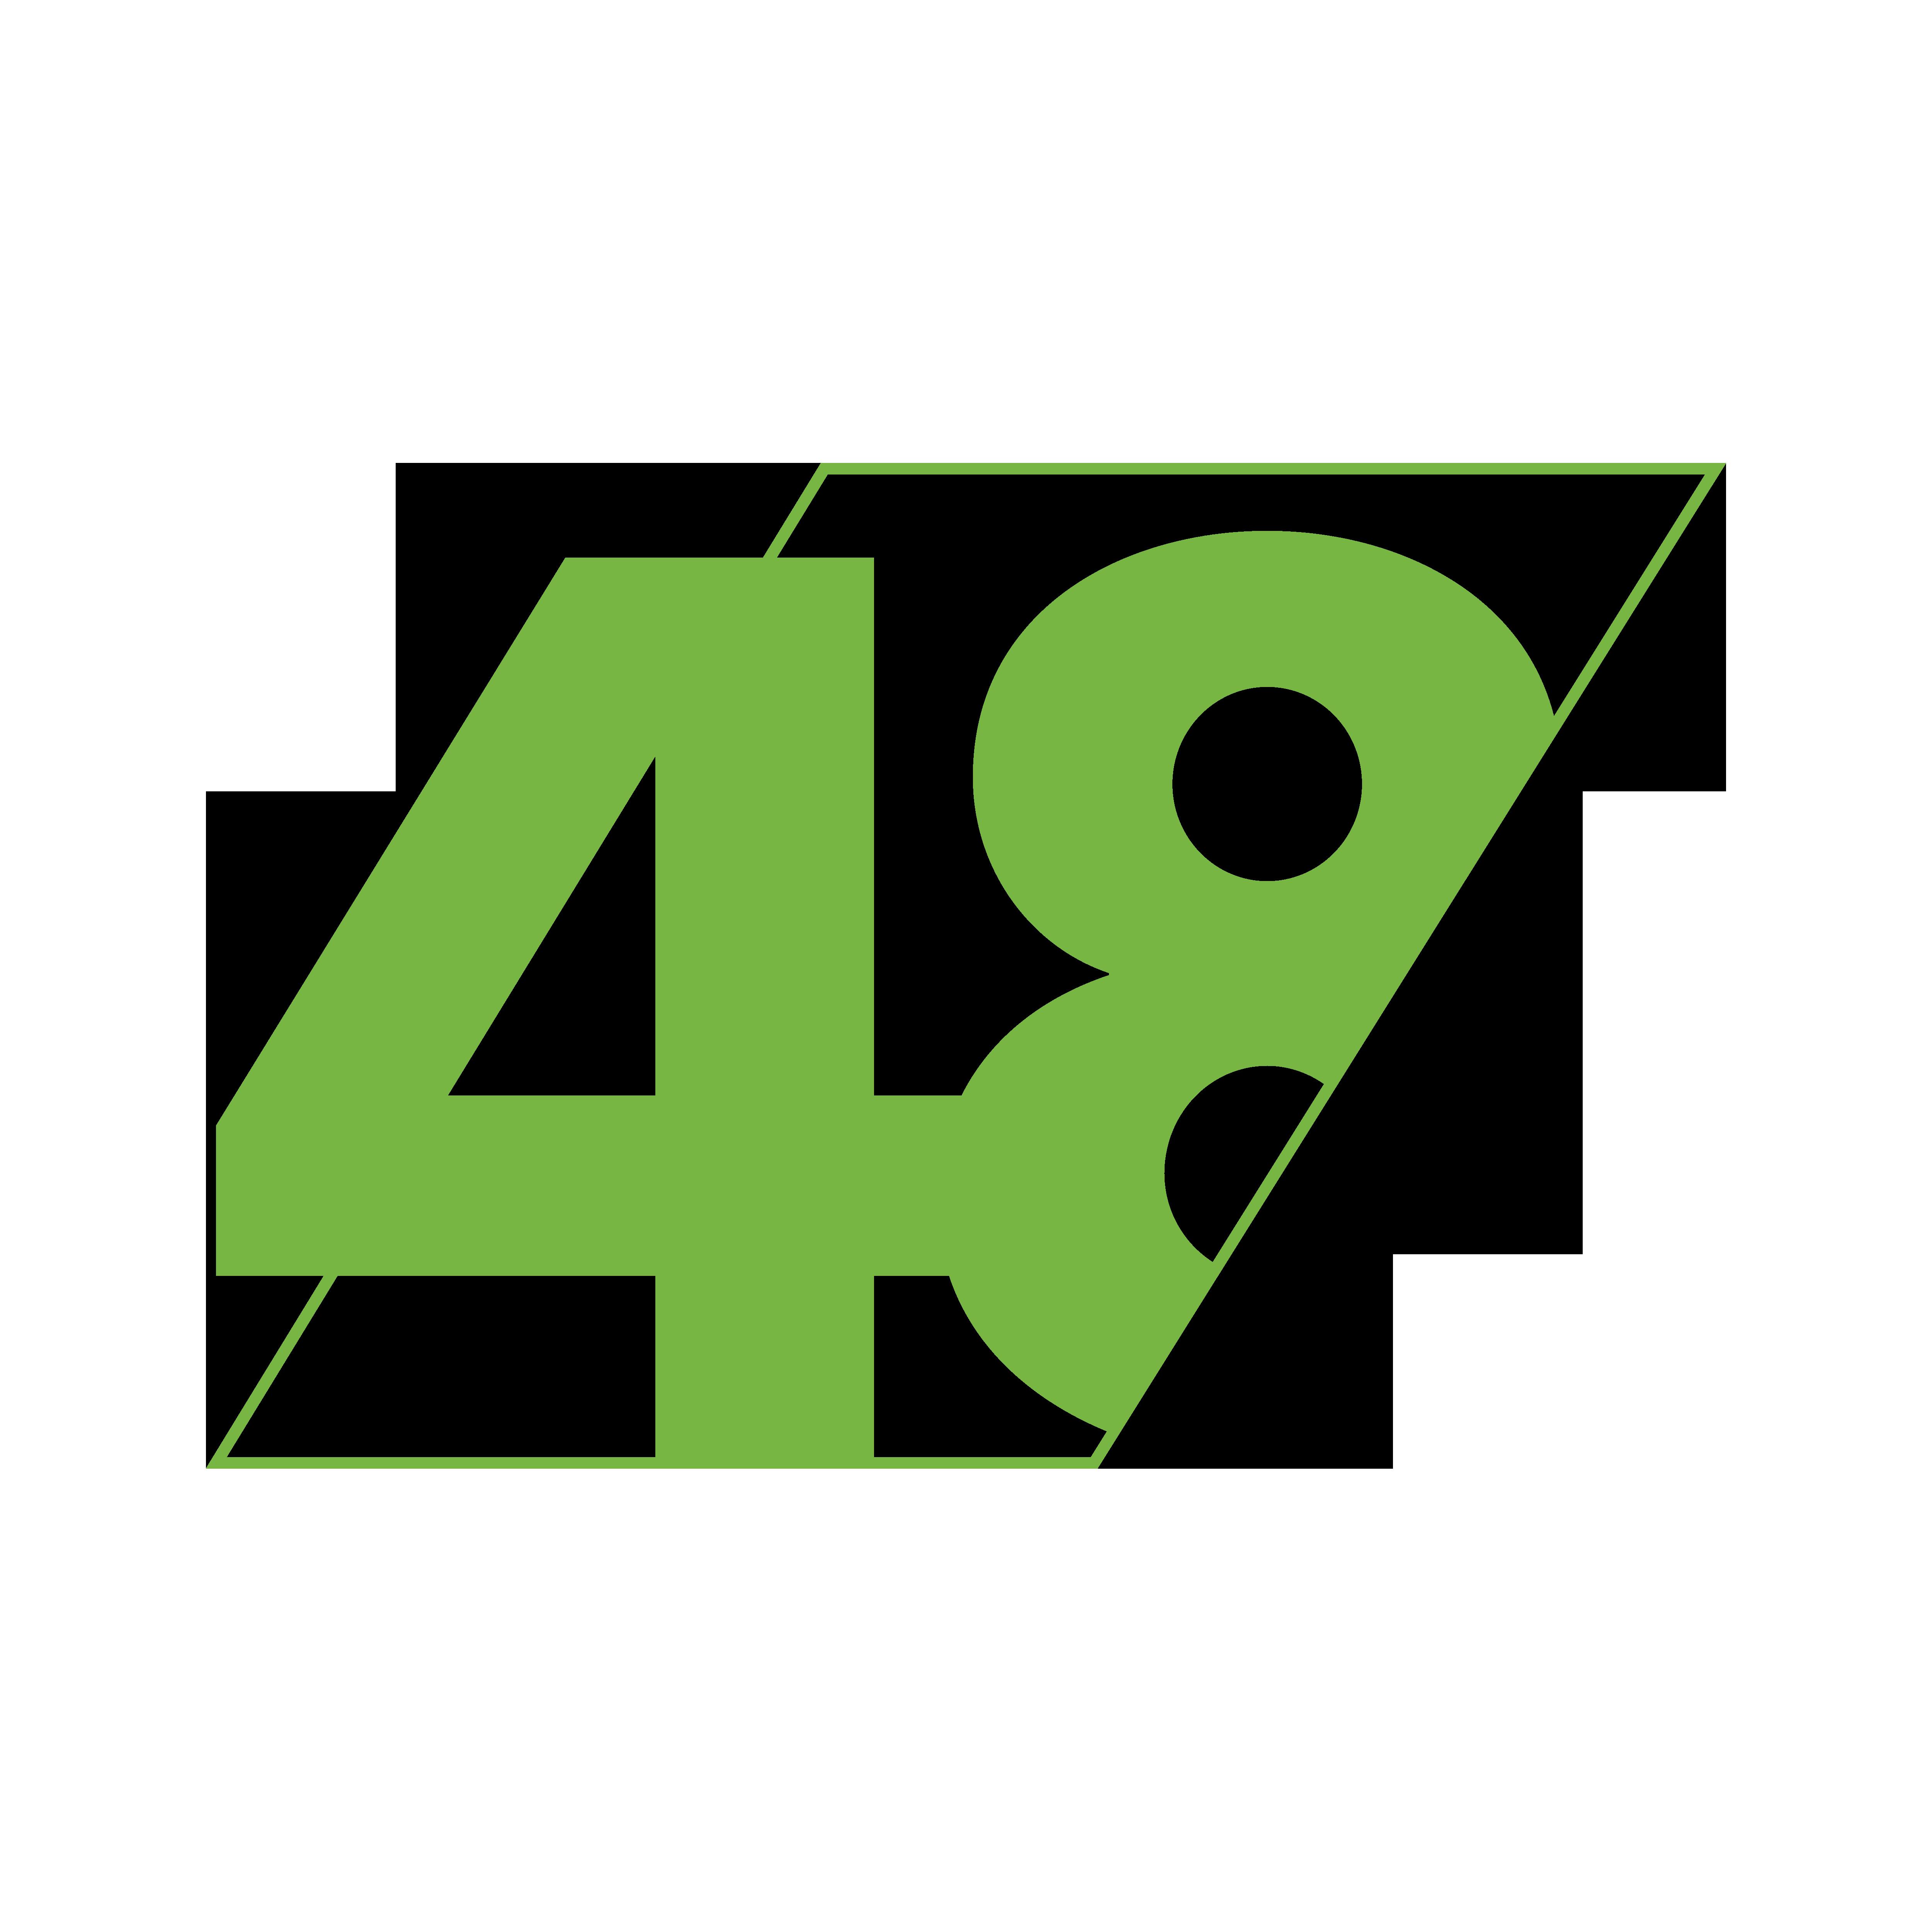 48Cyber